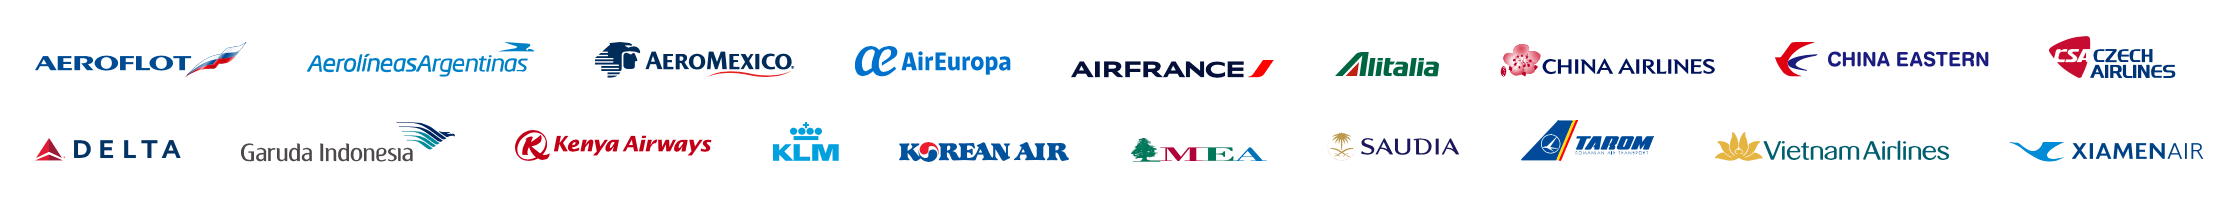 SkyTeam Partners as of 2020 Screenshot